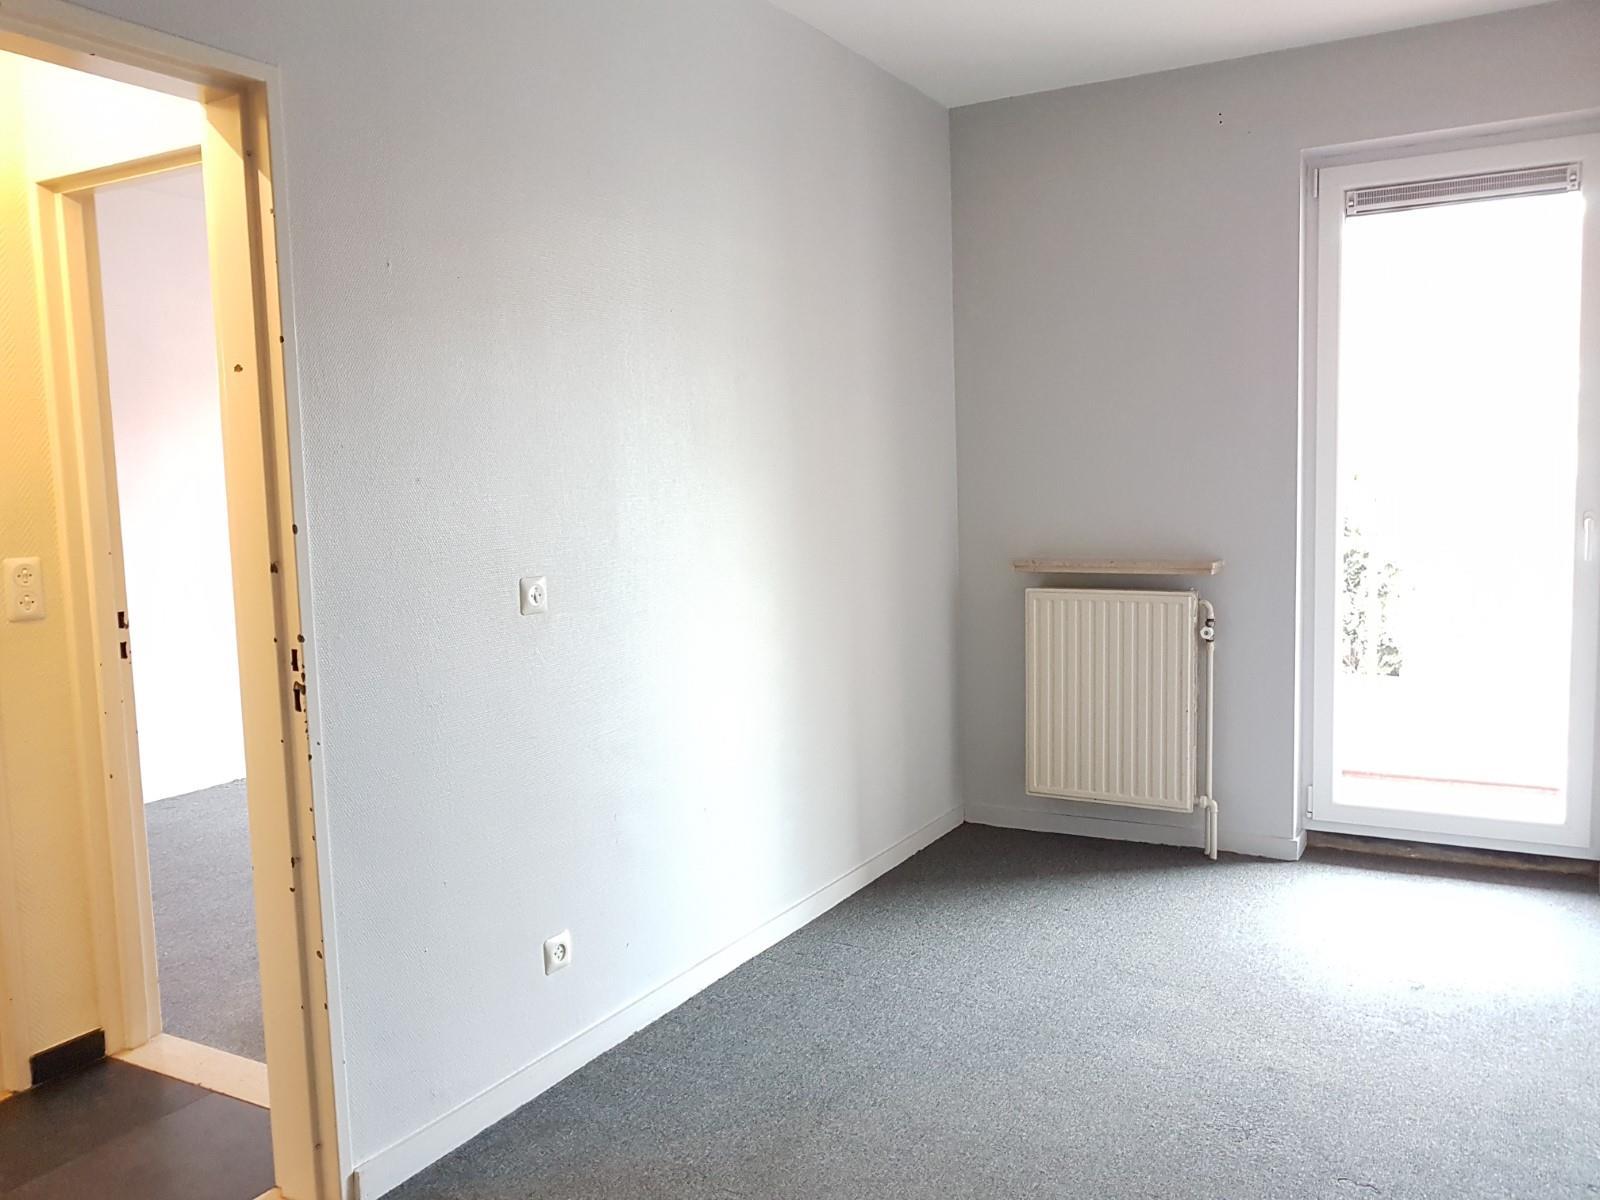 Flat - Auderghem - #3601569-6